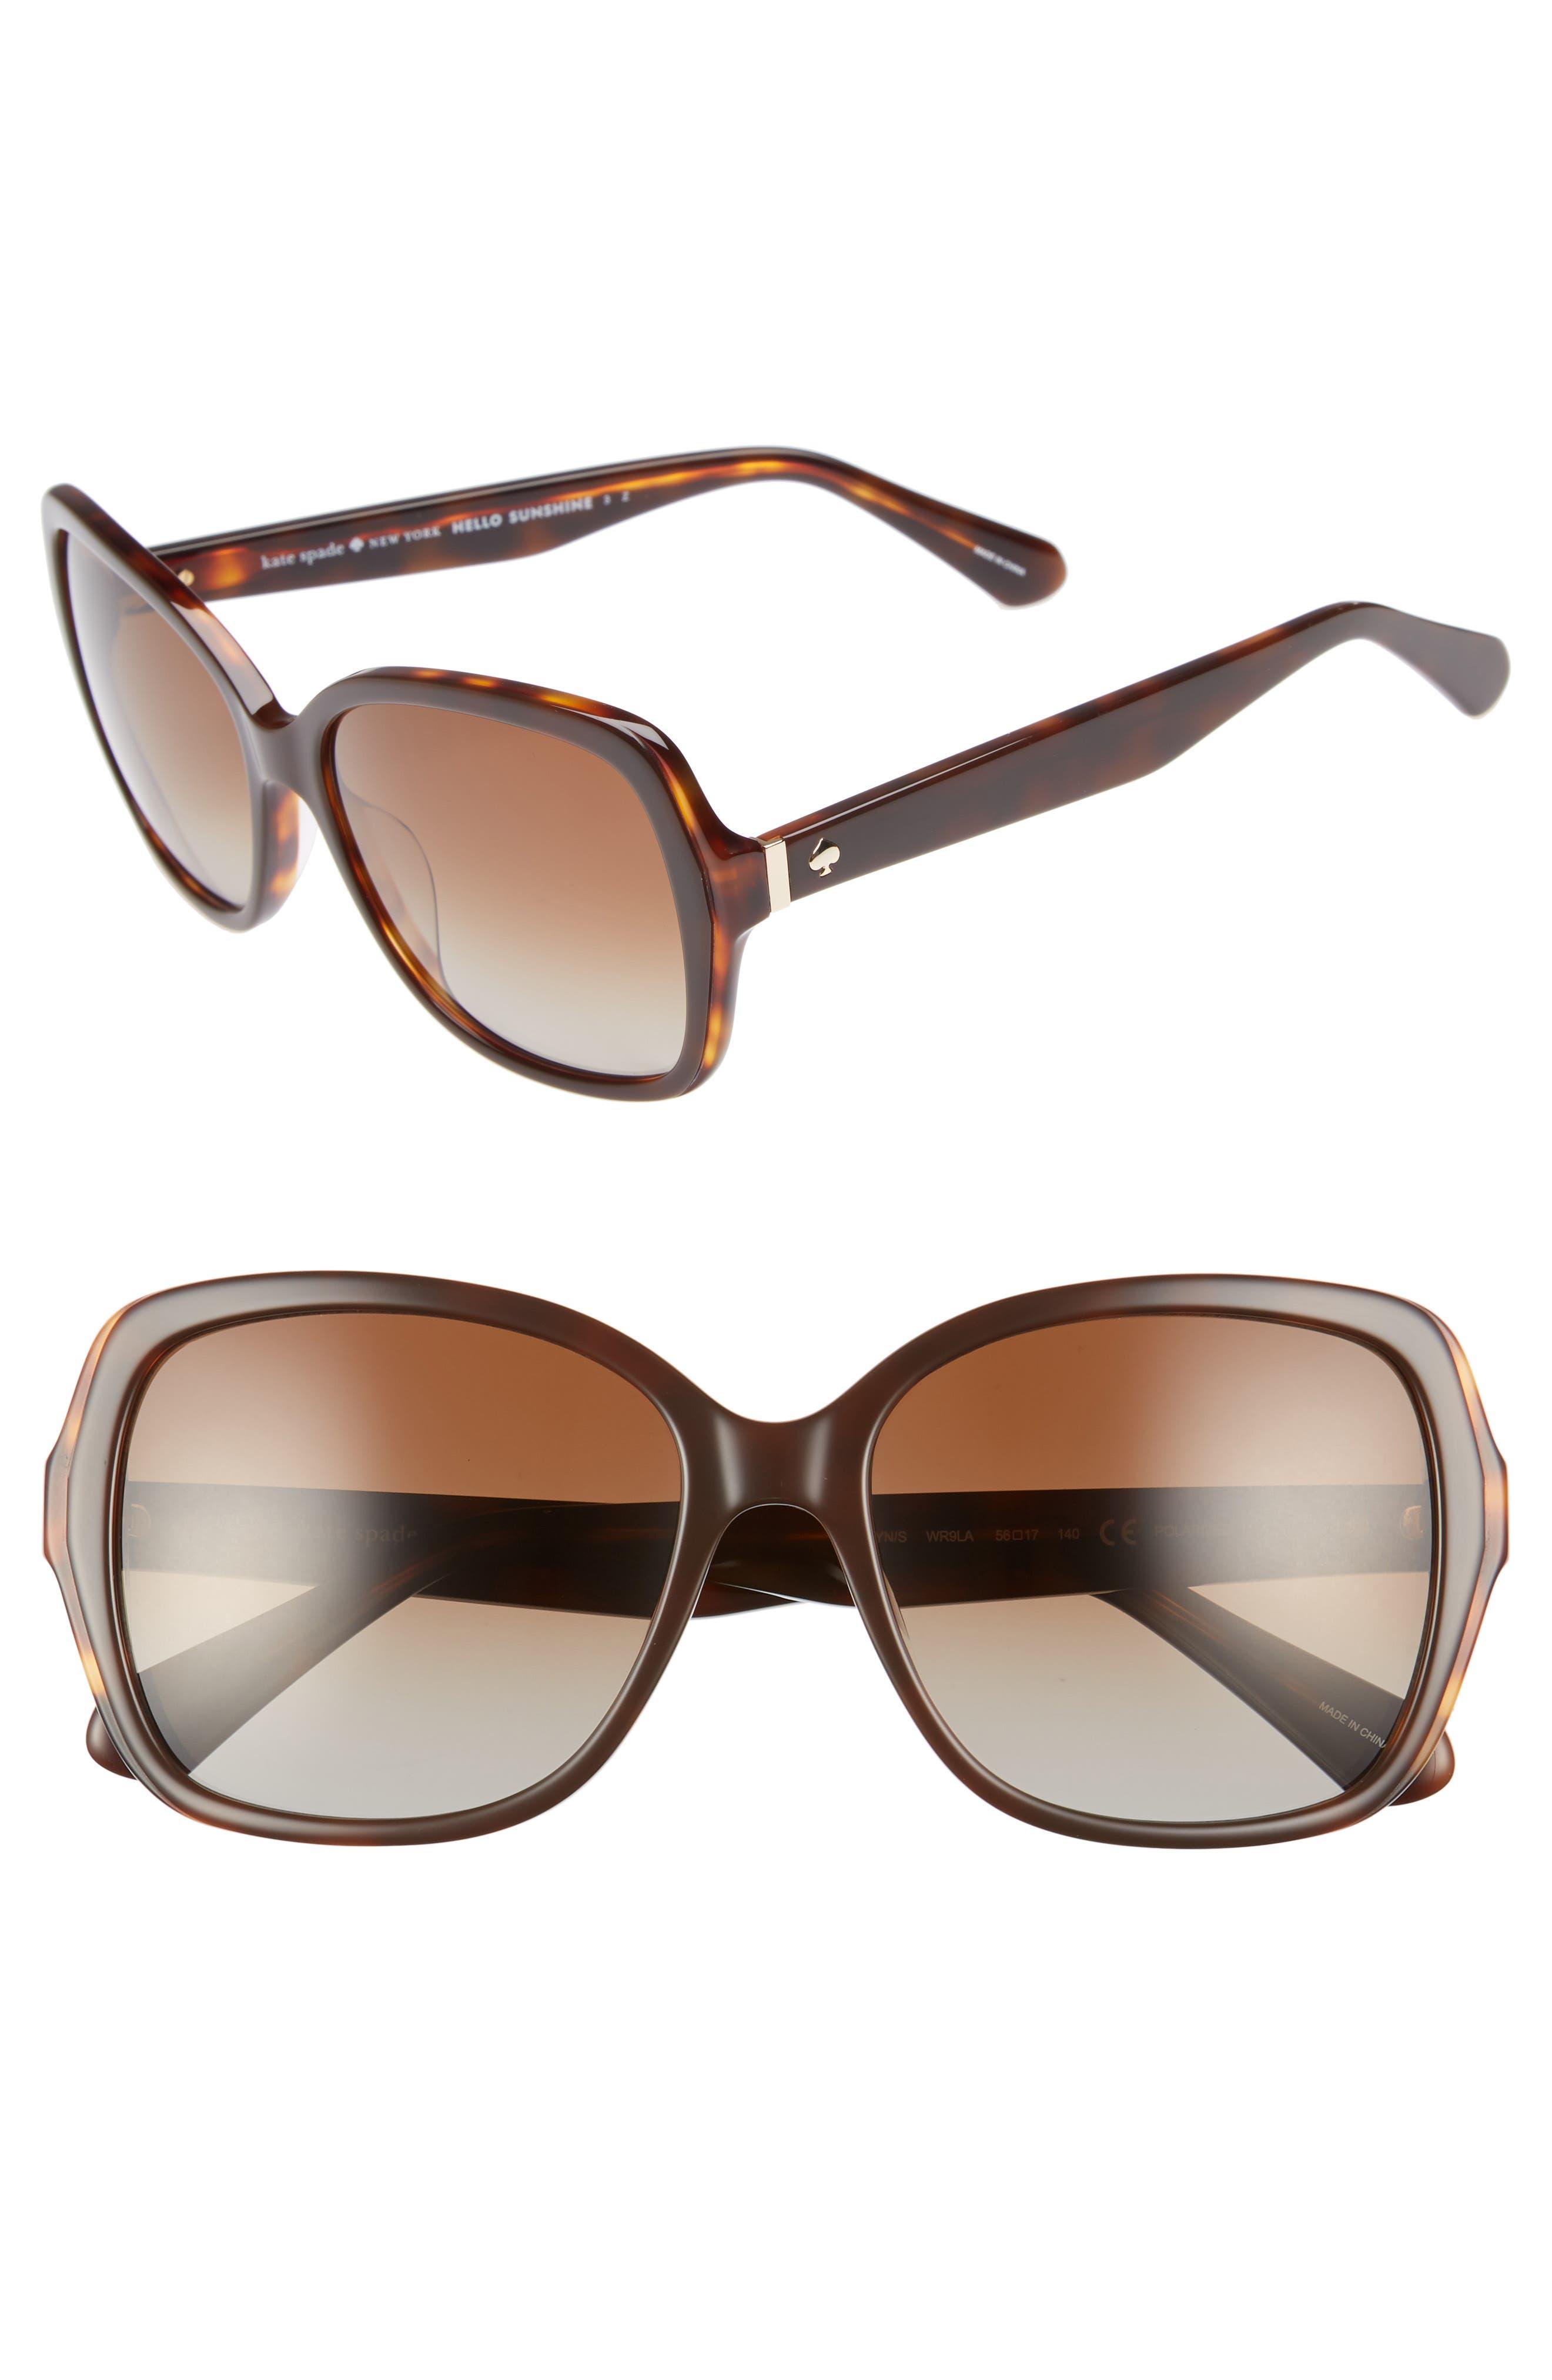 6d90db8eb80d Women's Round Sunglasses & Eyewear: kate spade new york | Nordstrom